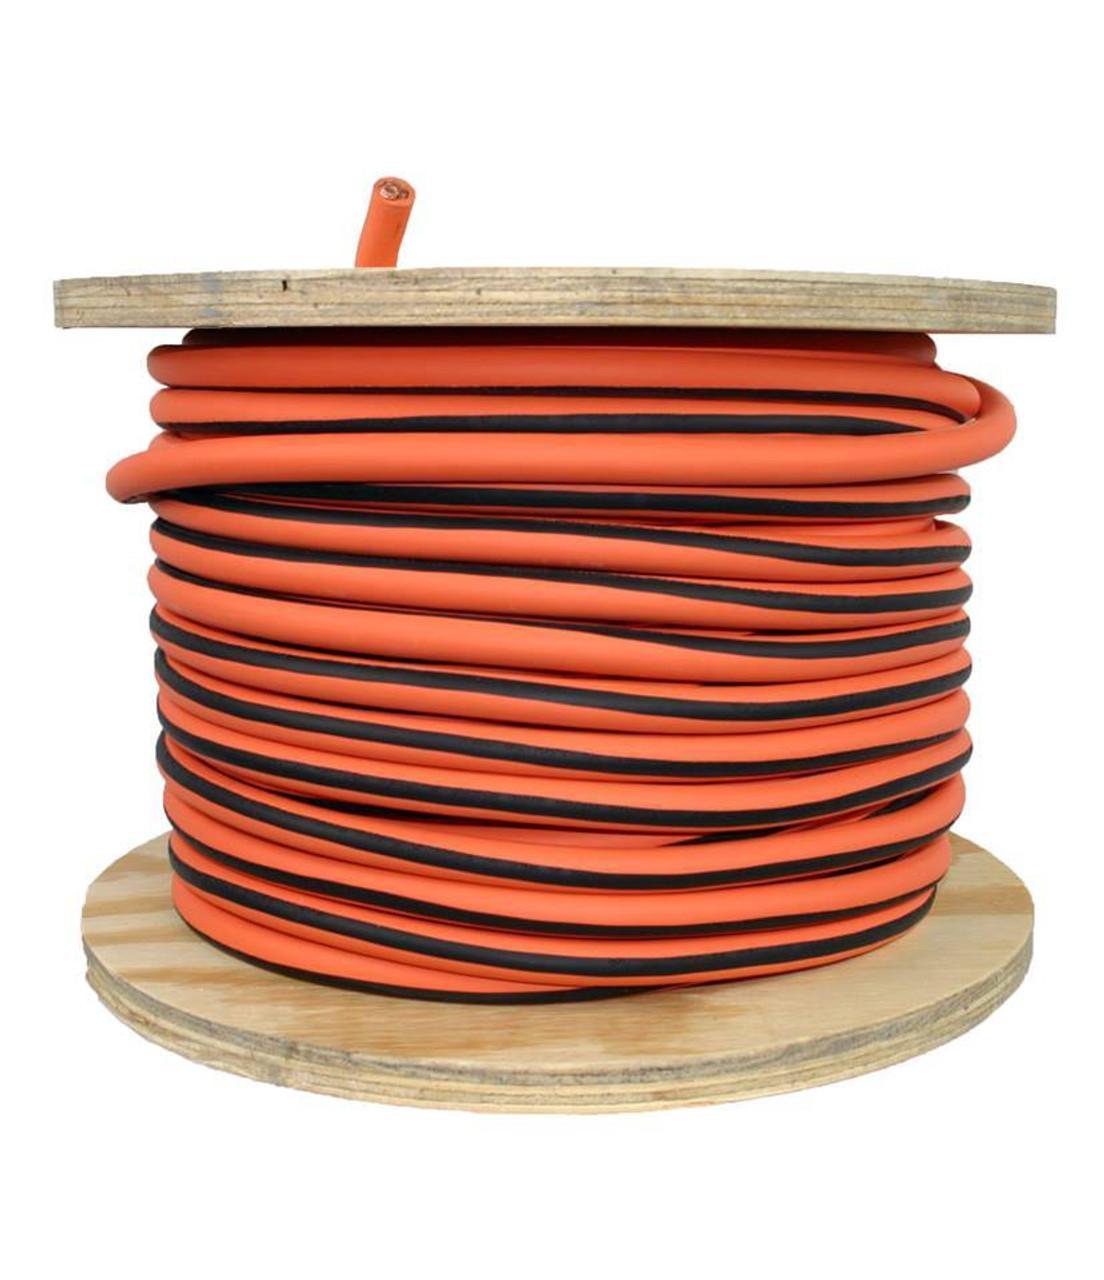 UltraFlex Welding Cable